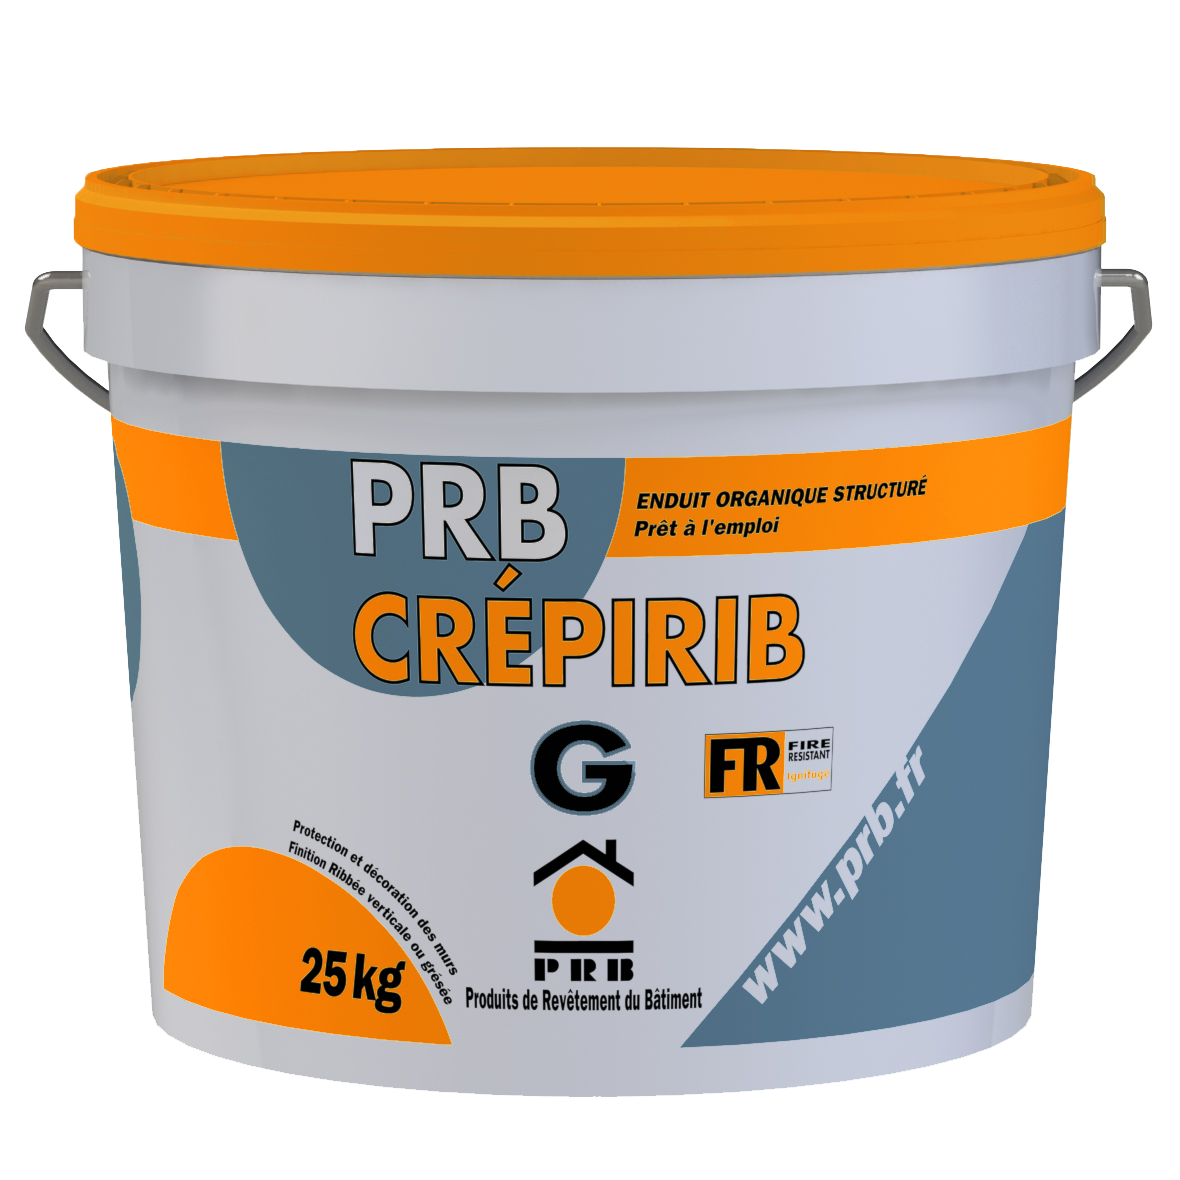 PRB CREPIRIB G 25 Kg